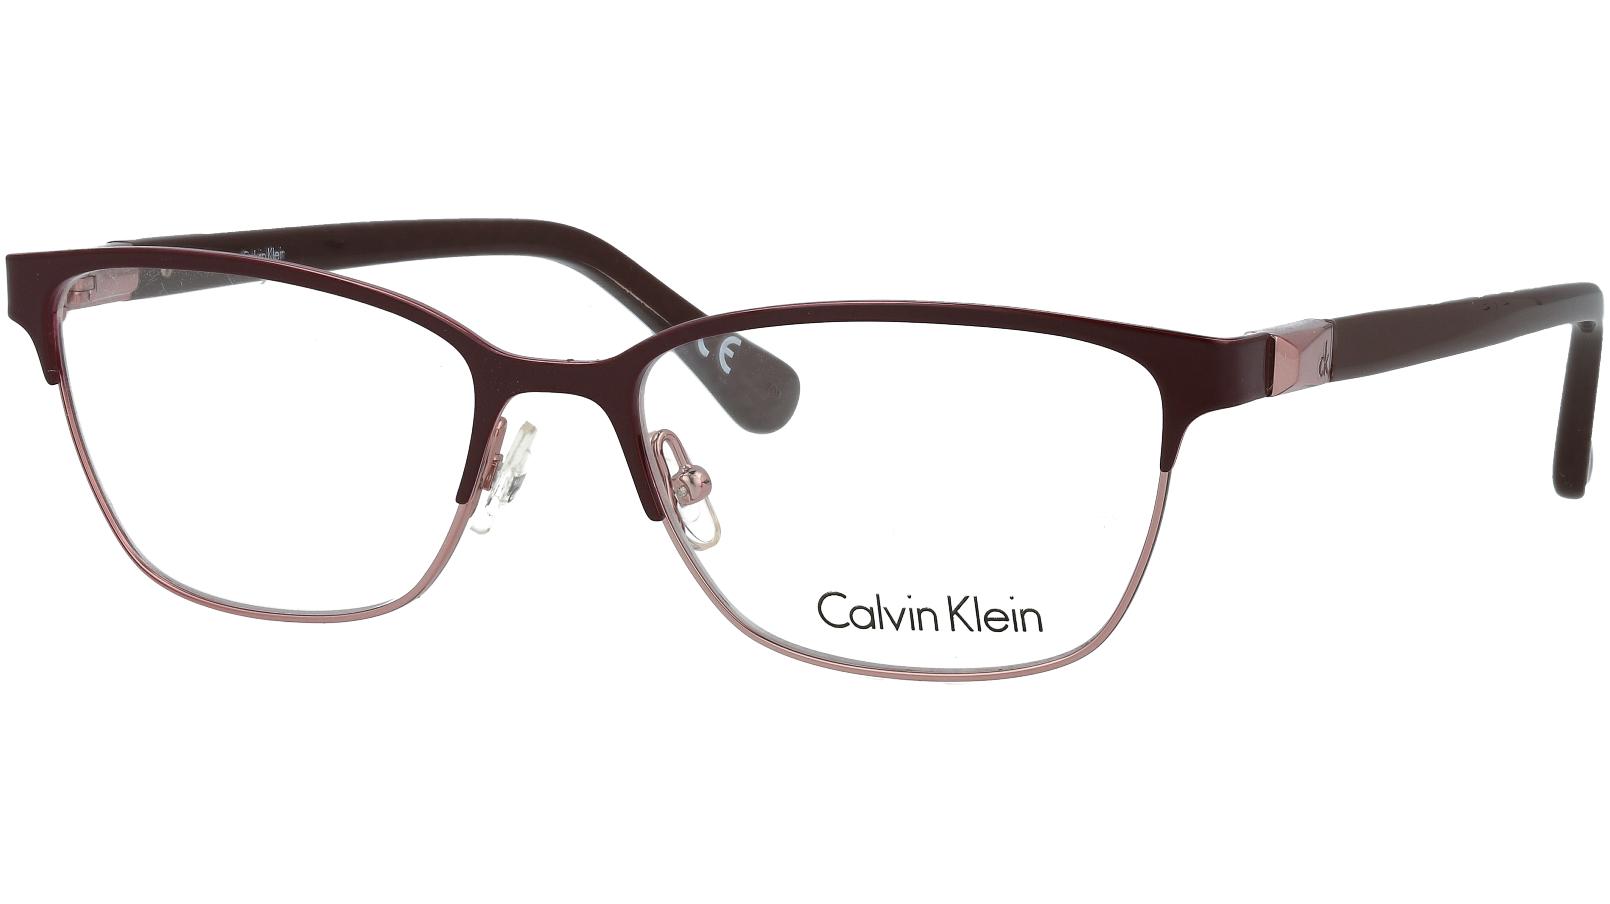 CALVIN KLEIN CK5431 604 52 PURPLE Glasses